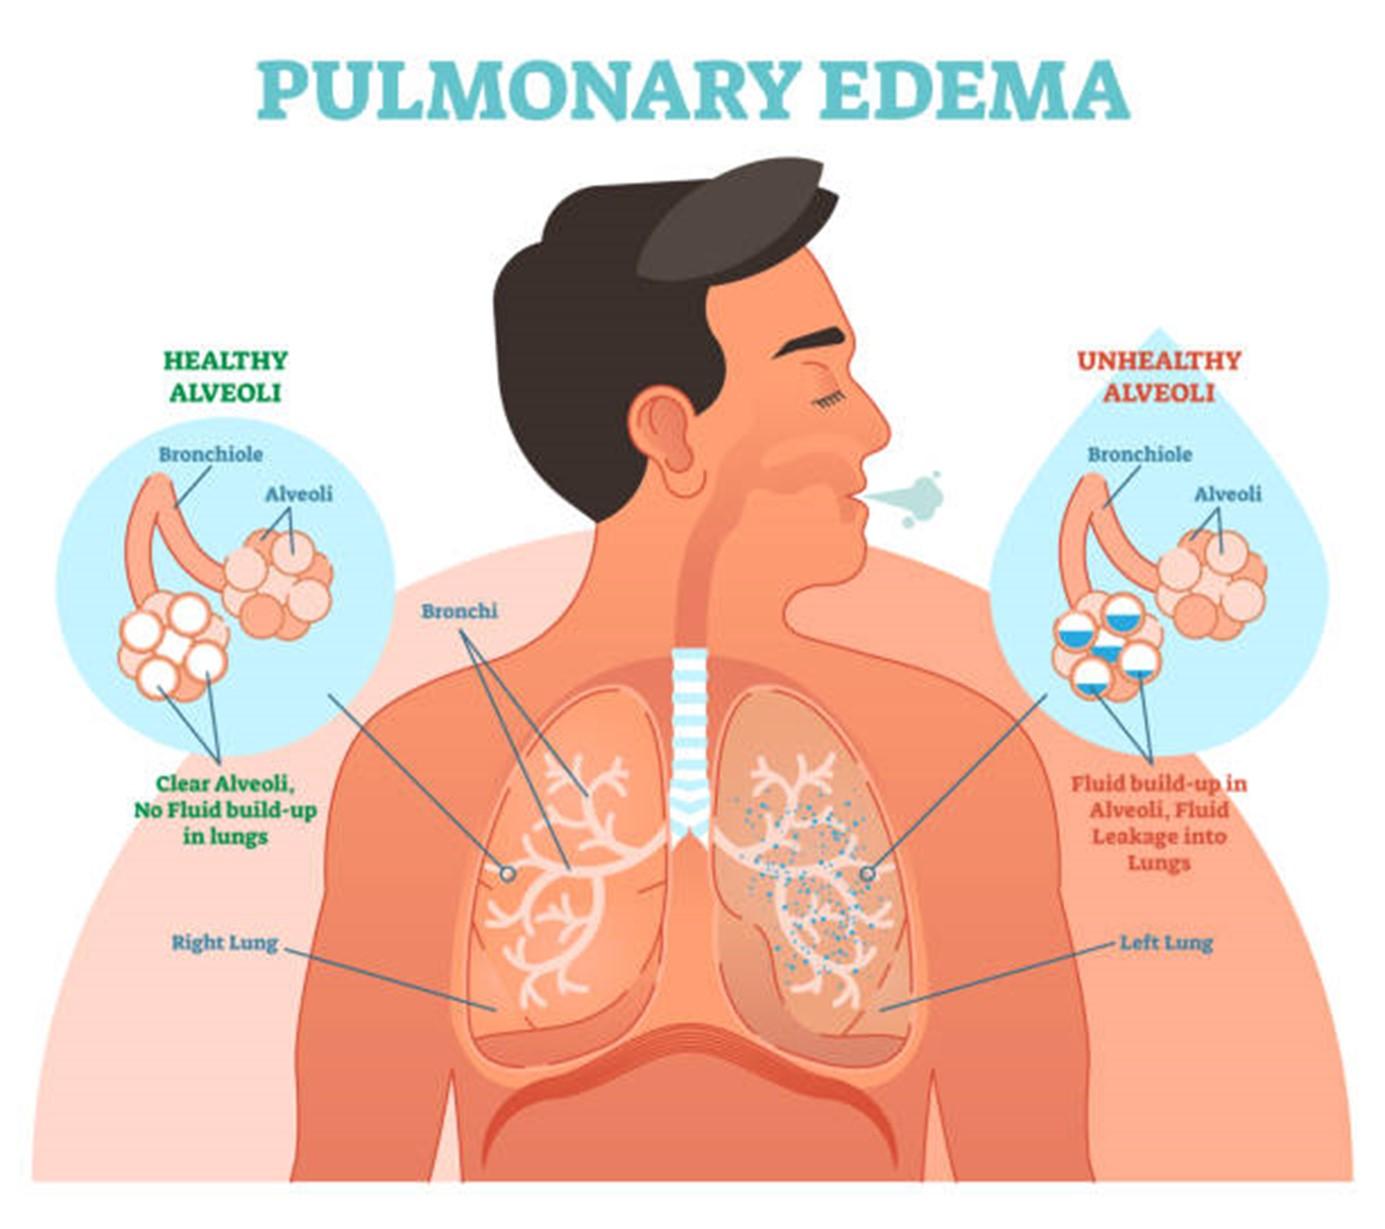 HAPE lung visualization